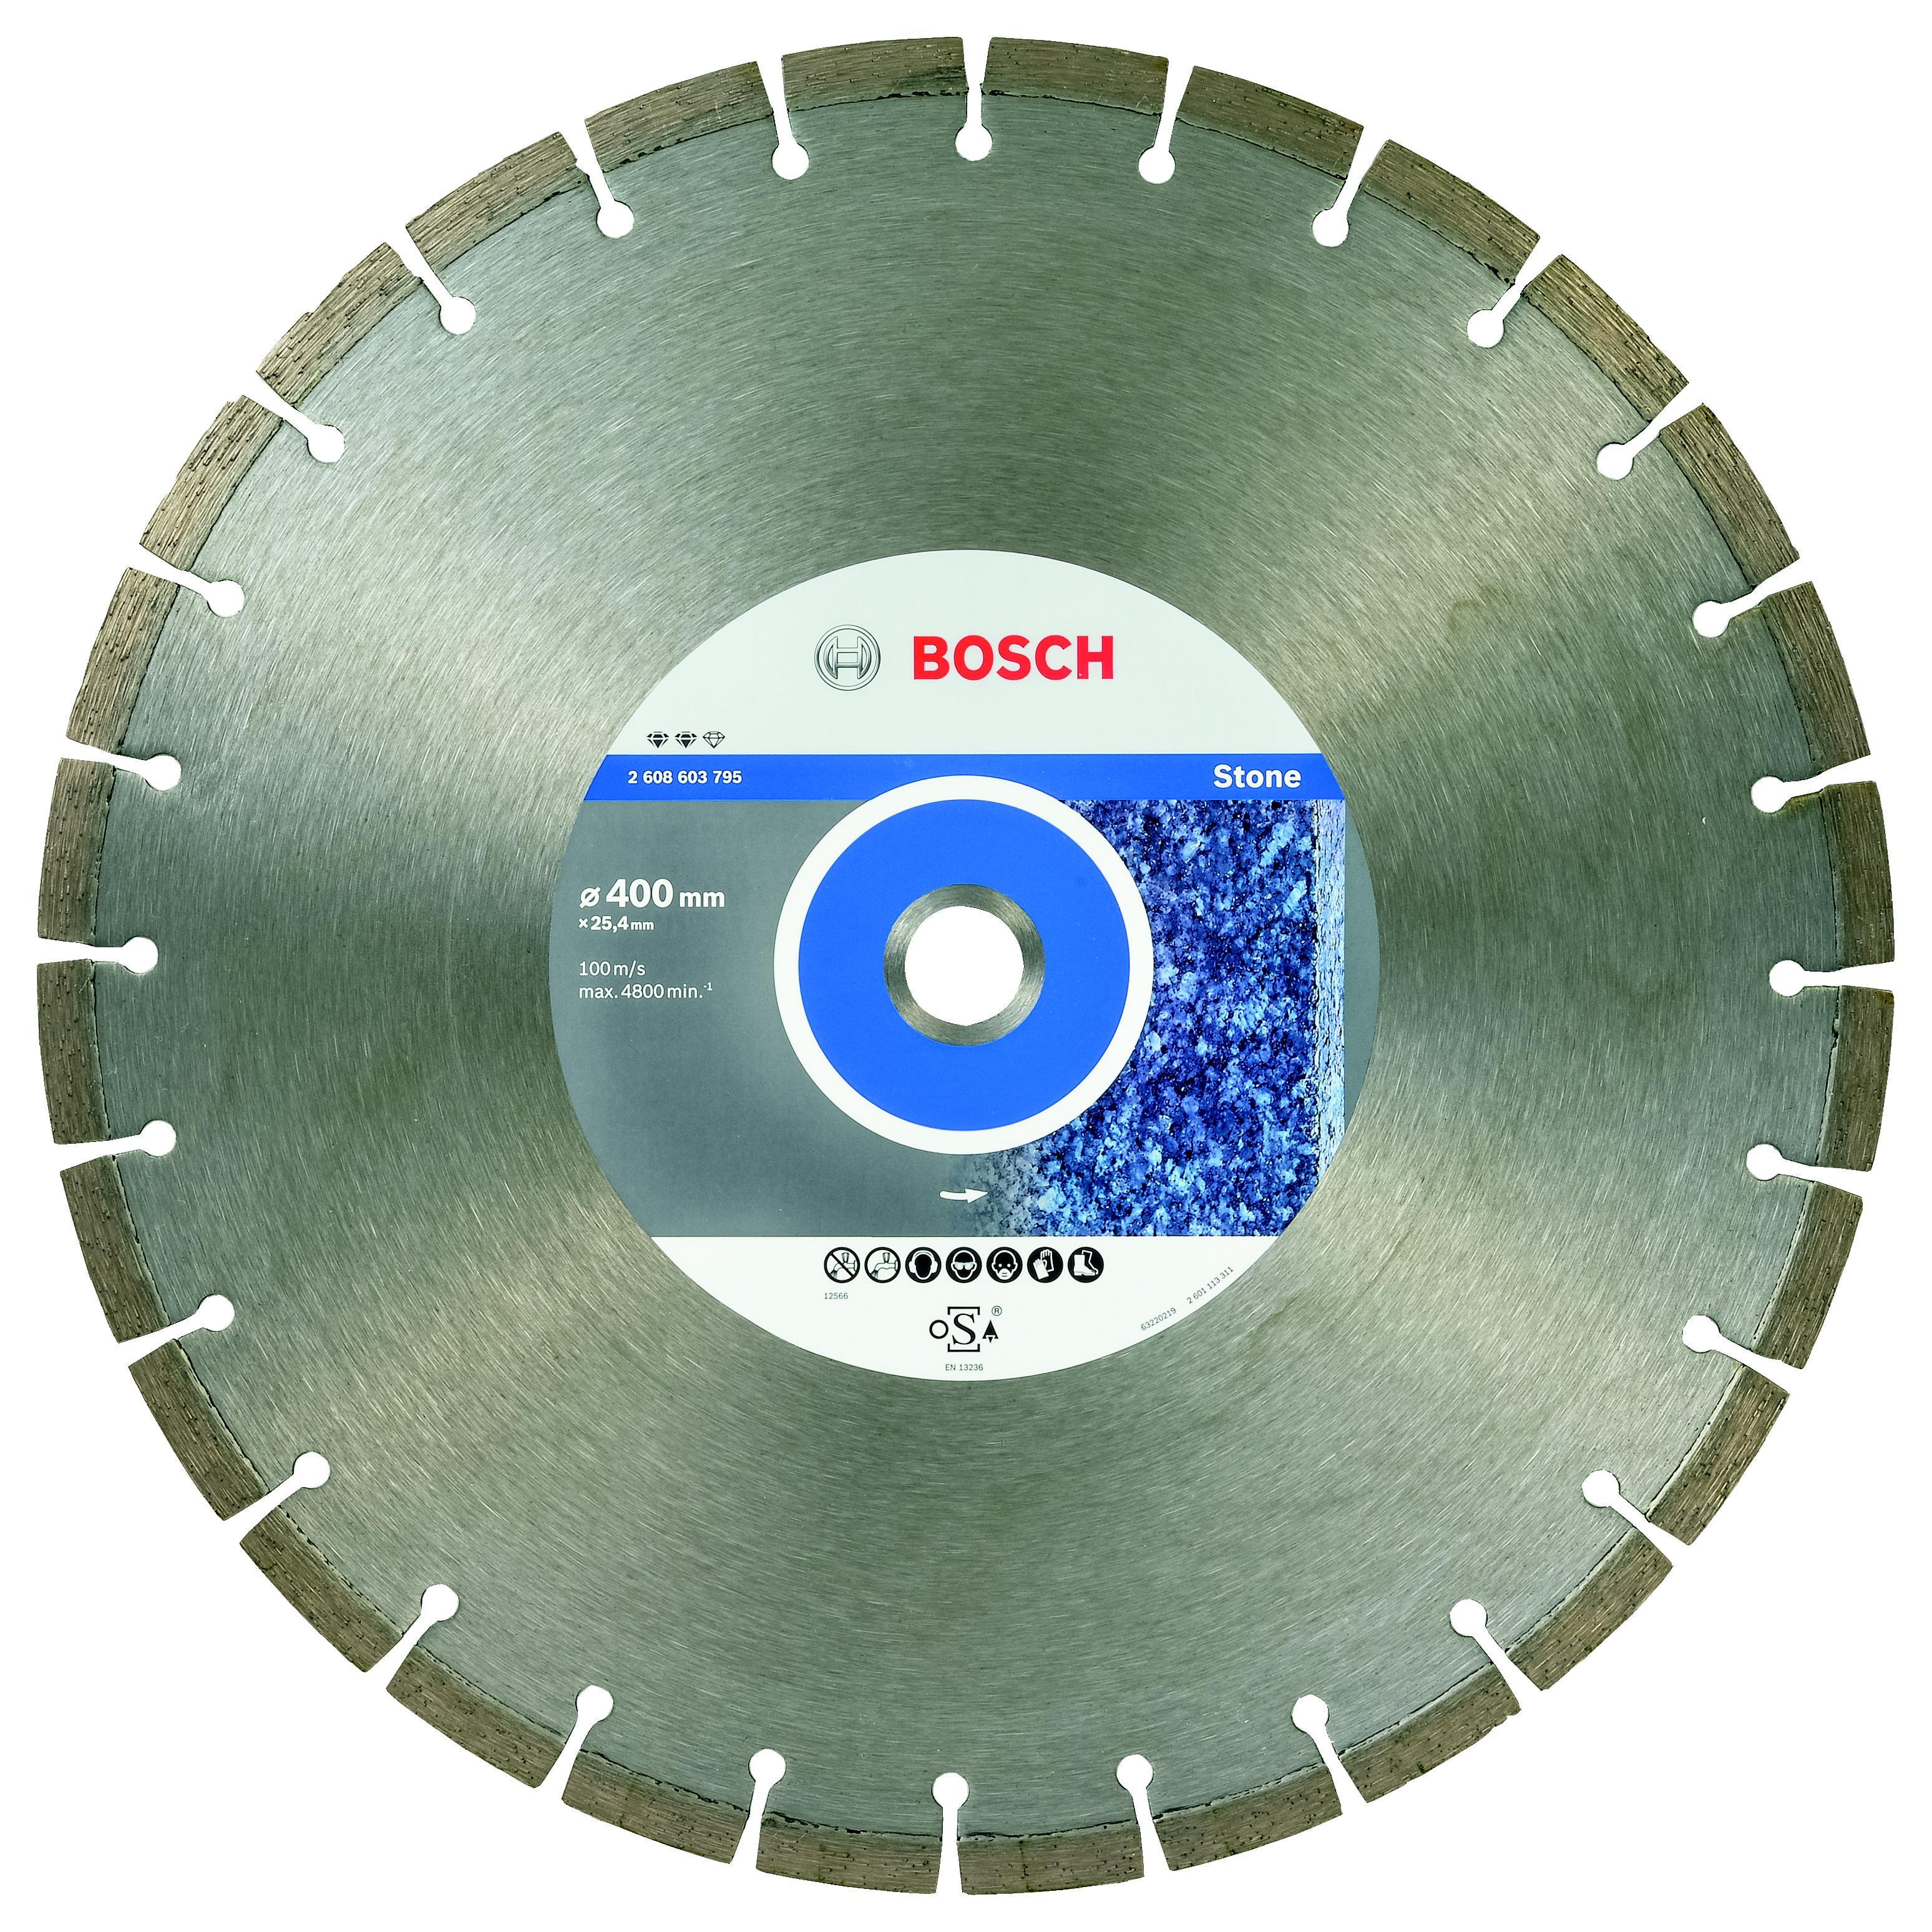 Круг алмазный Bosch 2608603795 expert for stone, 2608603795 expert for stone